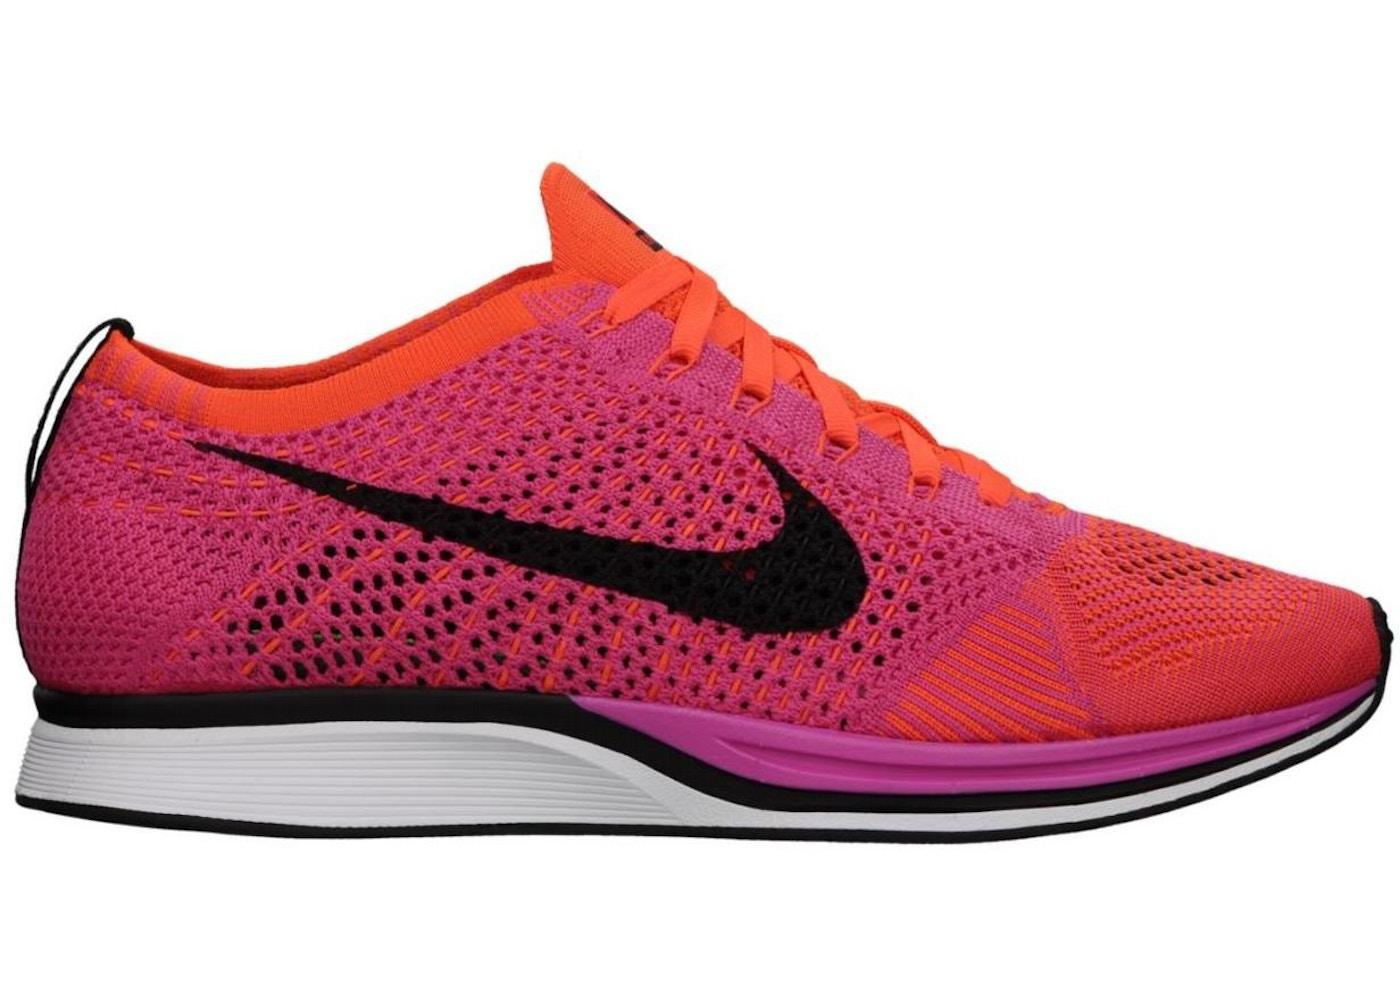 06e48e44b3dc Nike Flyknit Racer Pink Flash - 526628-600